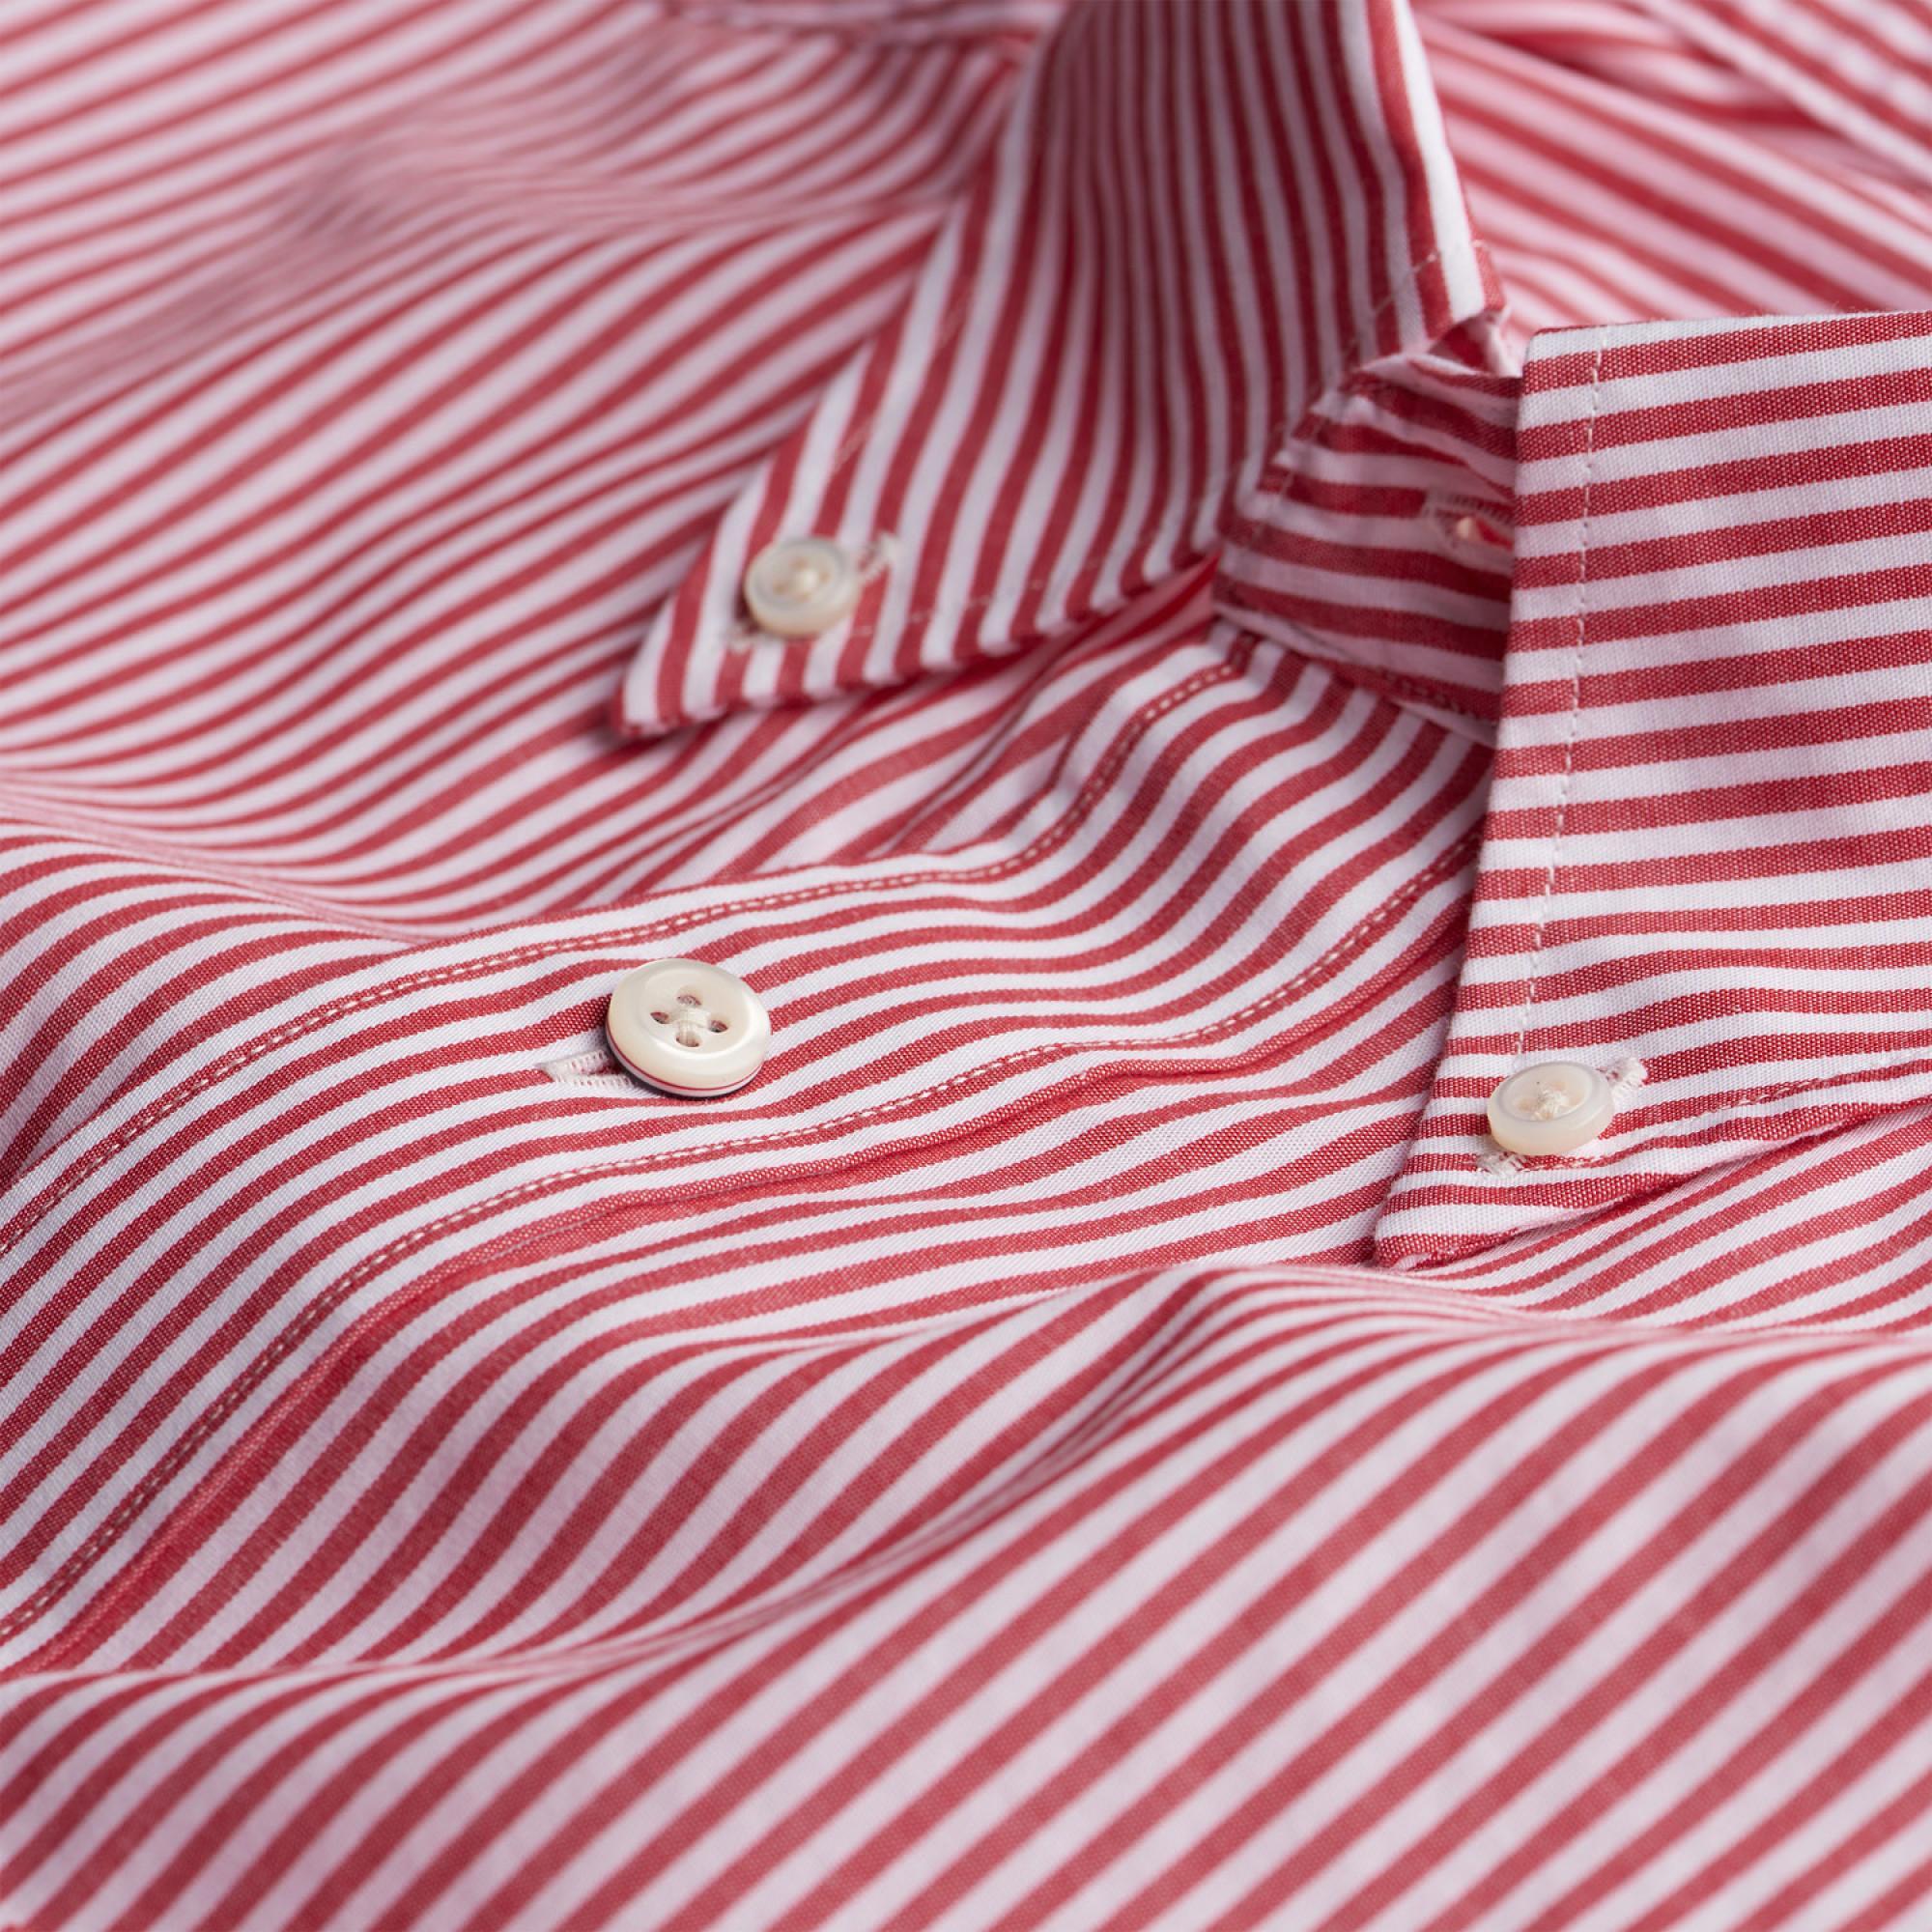 487658c216 Gant - Red Banker Striped Fitted Shirt for Men - Lyst. View fullscreen